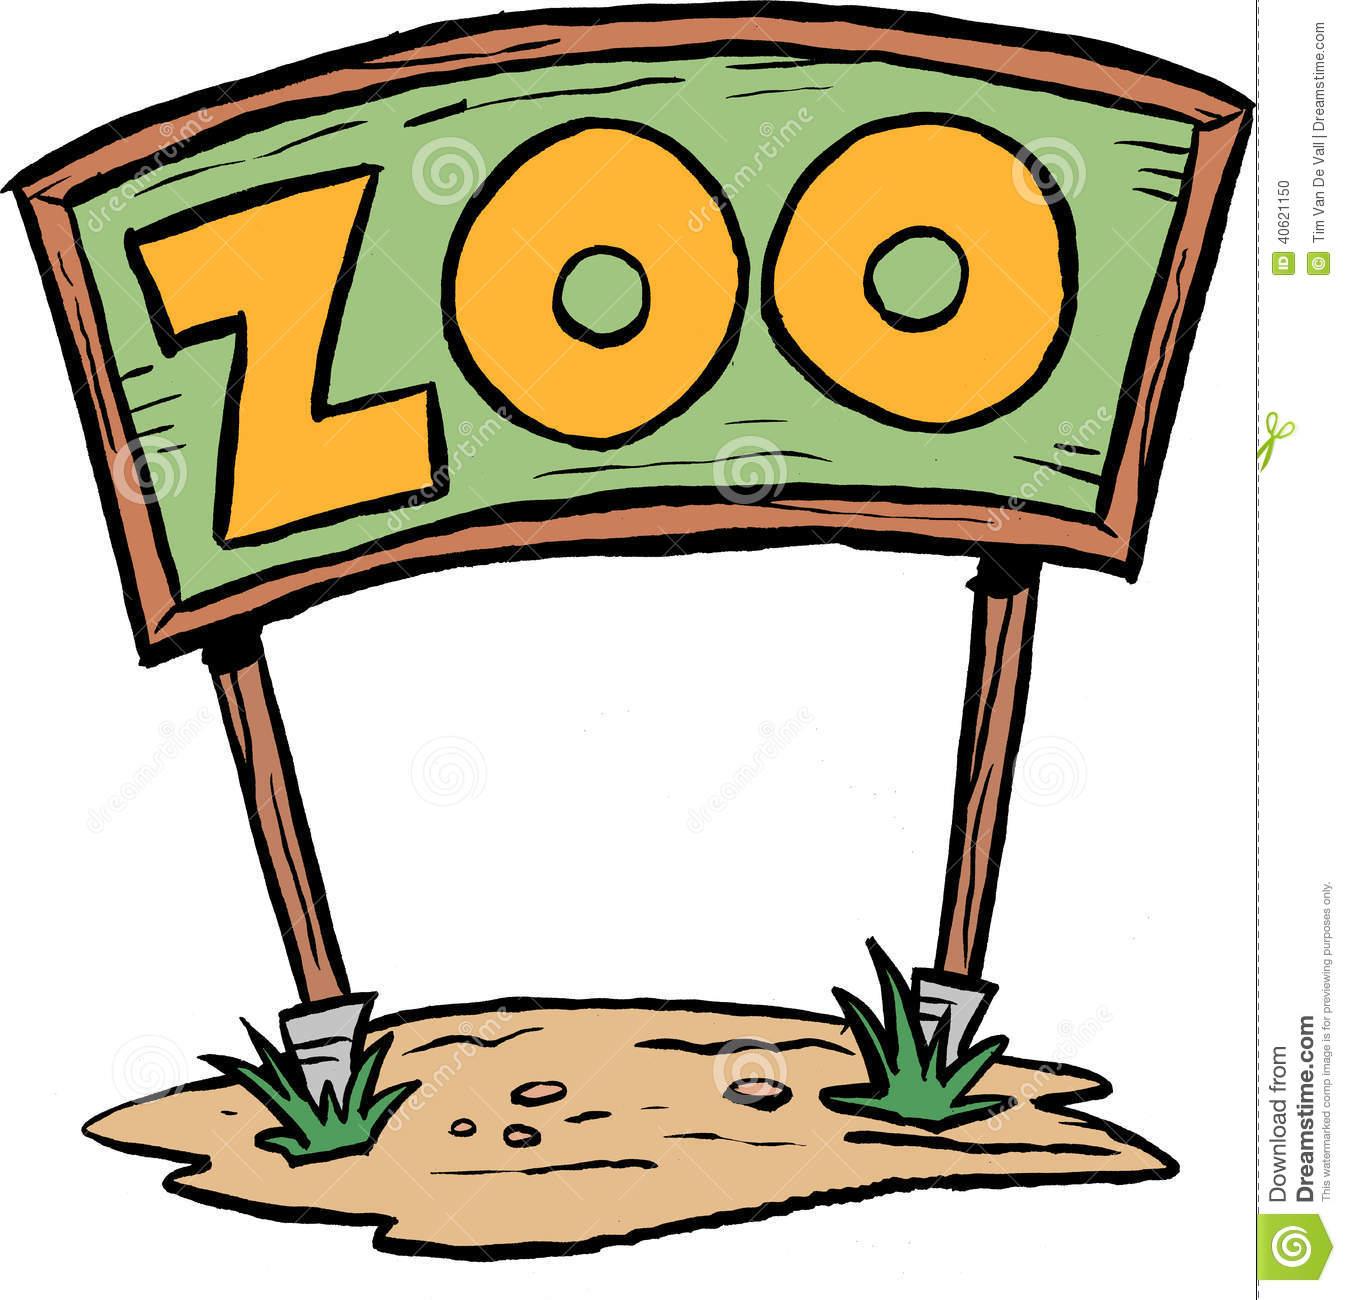 Zoo clipart Zoo #22 Clipart Savoronmorehead Zoo